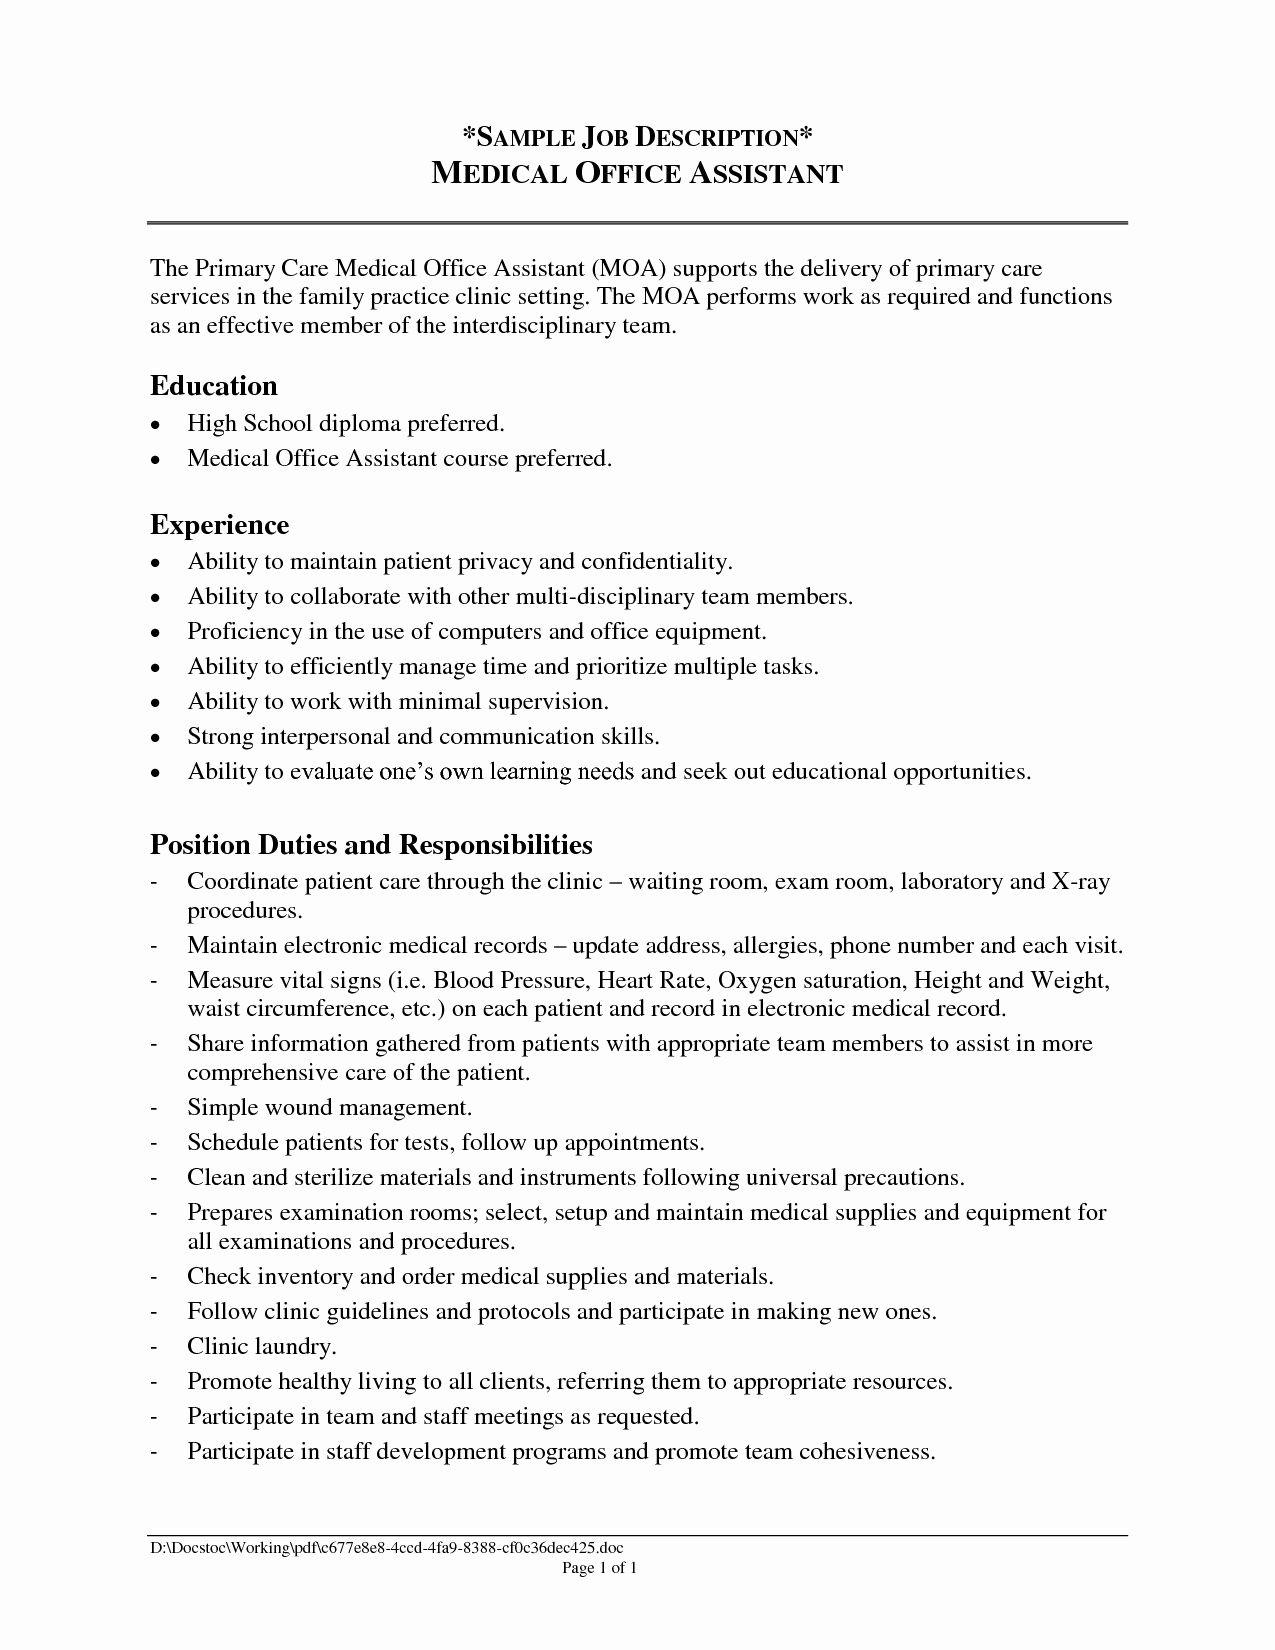 Office Assistant Job Description Resume New Fice Assistant Job Descri In 2021 Medical Assistant Resume Administrative Assistant Job Description Office Assistant Resume